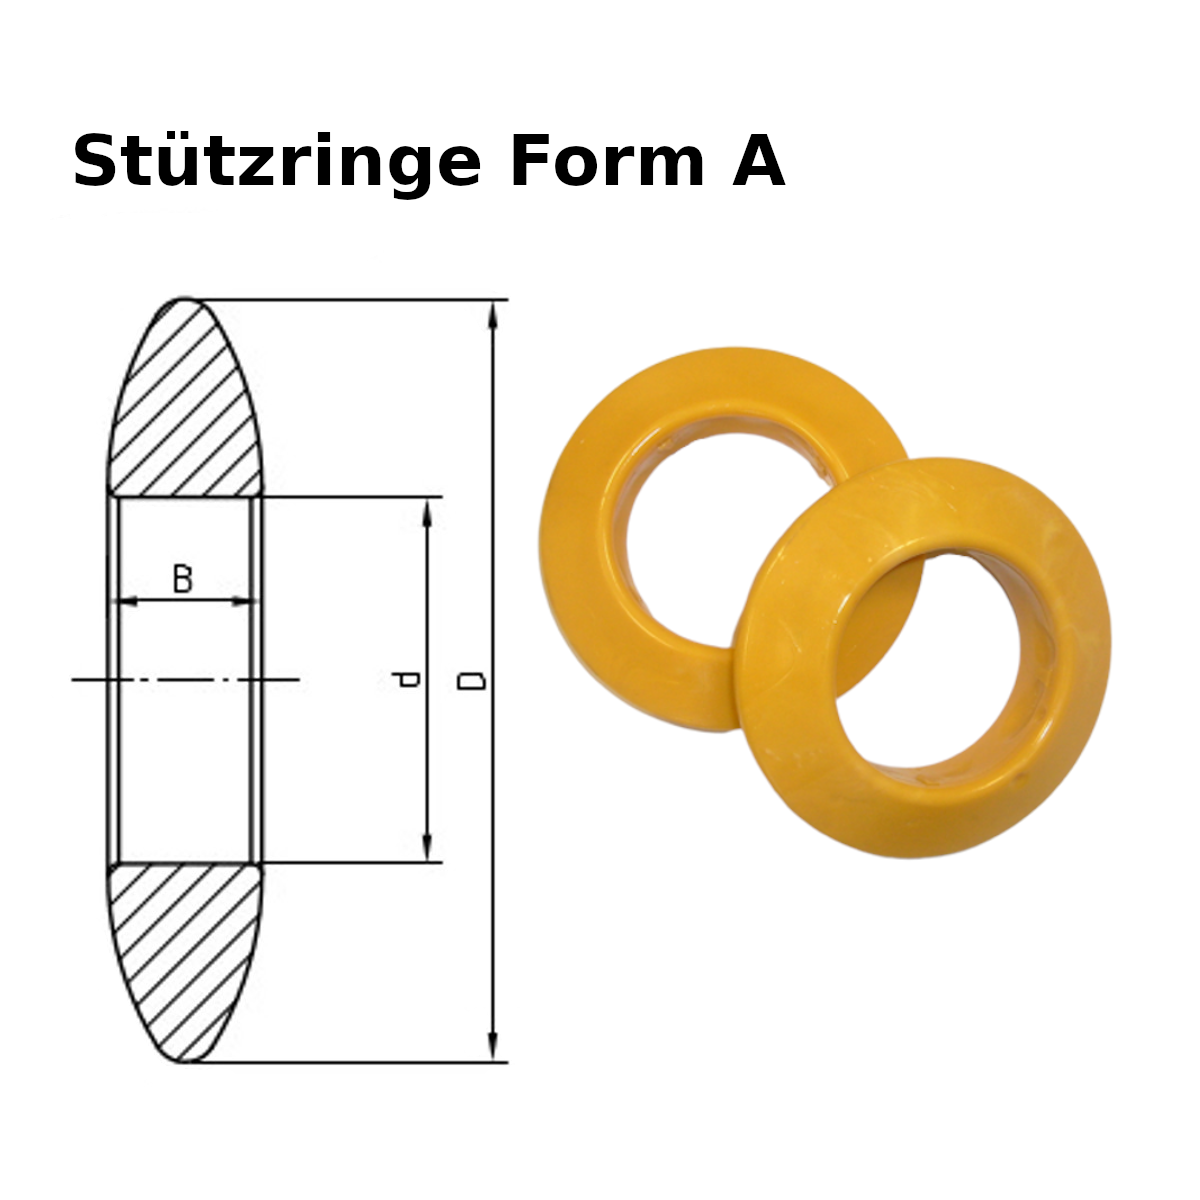 Stützringe Form A